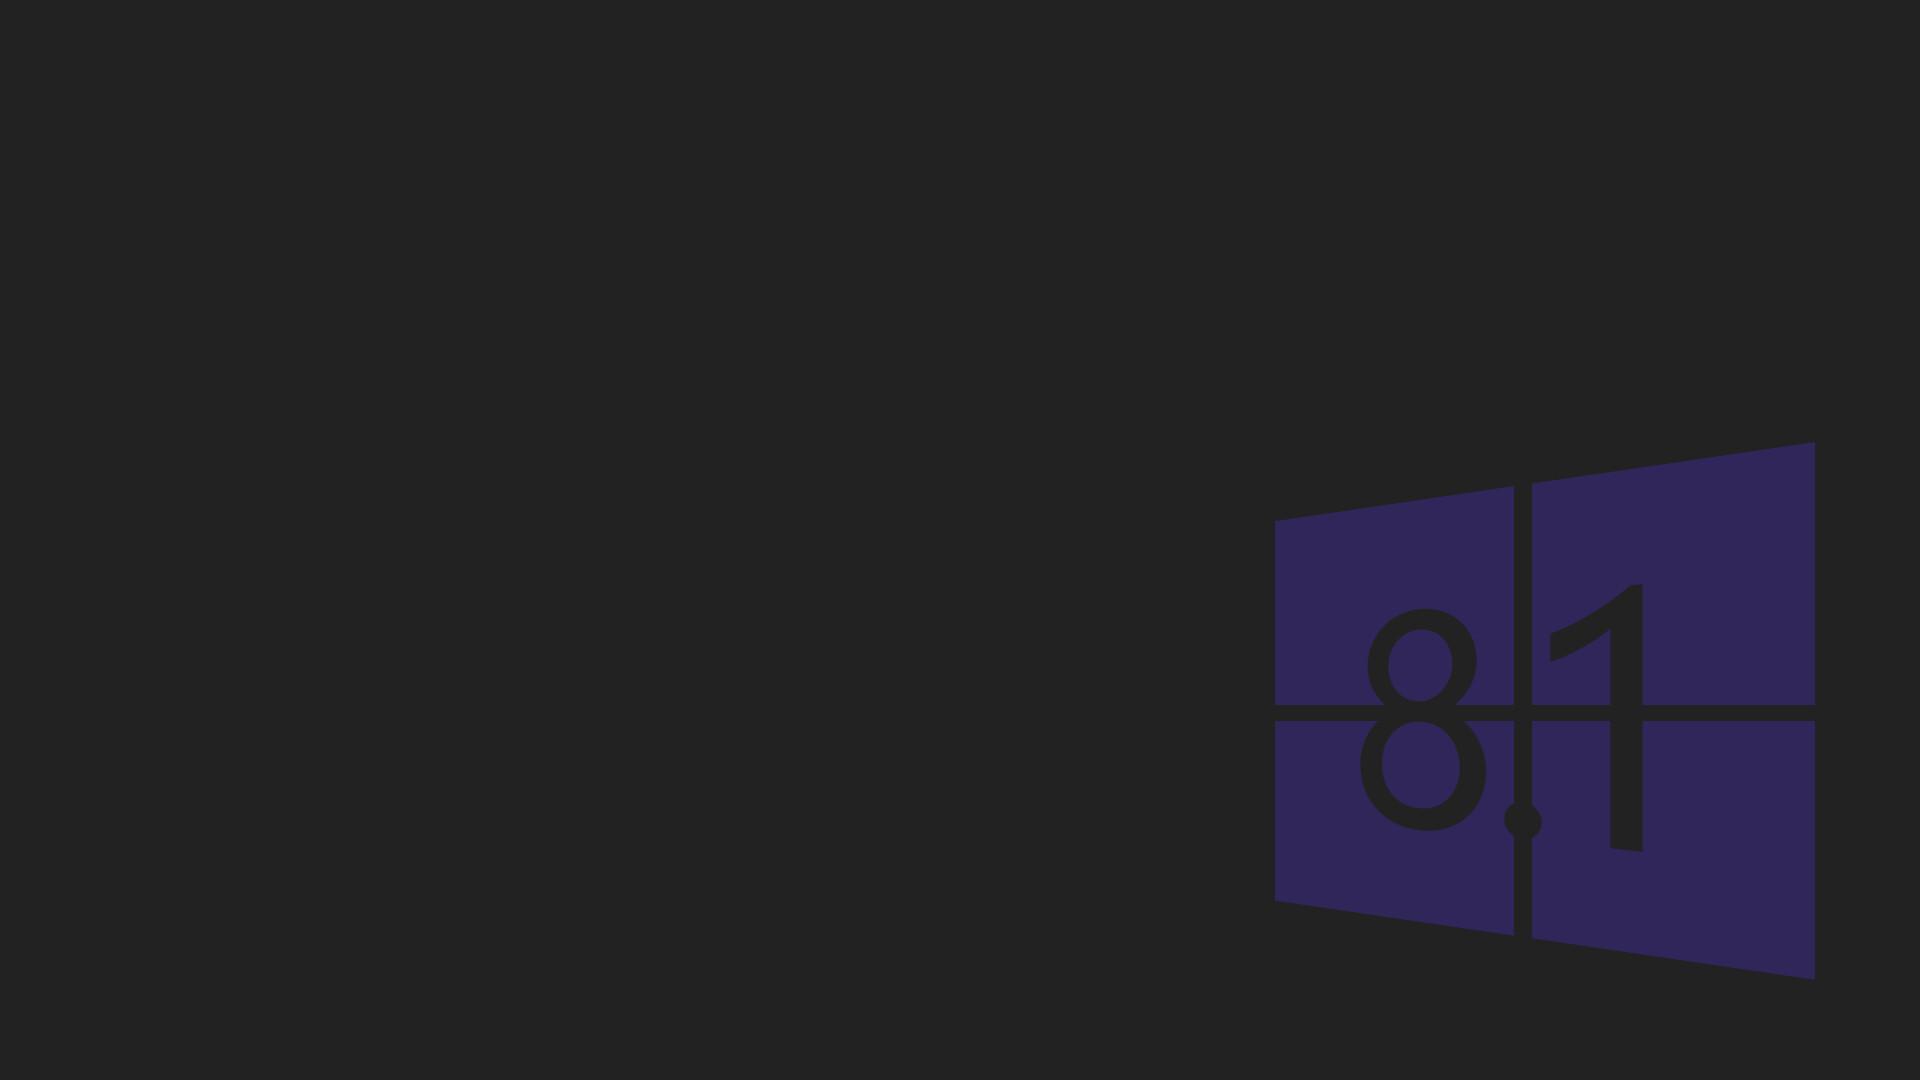 windows 8 black wallpaper (56+ images)